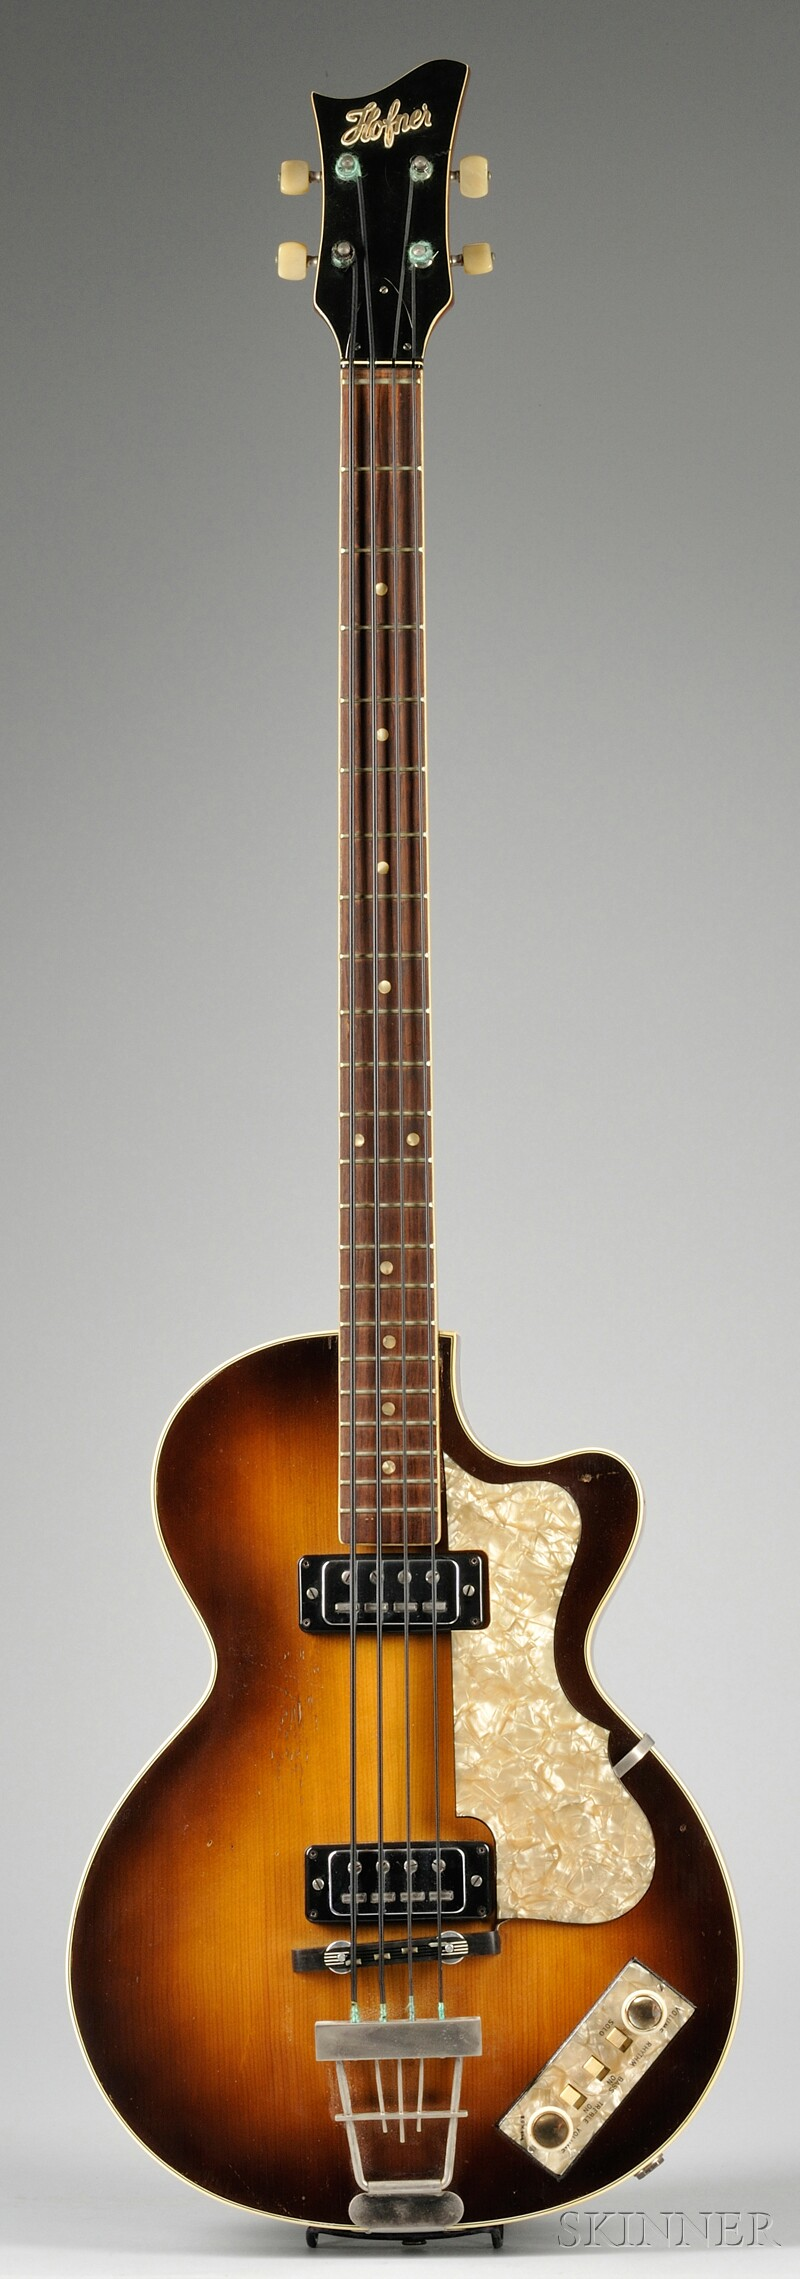 German Electric Bass Guitar, Karl Hofner Company, Schonbach, 1965, Model Club Bass